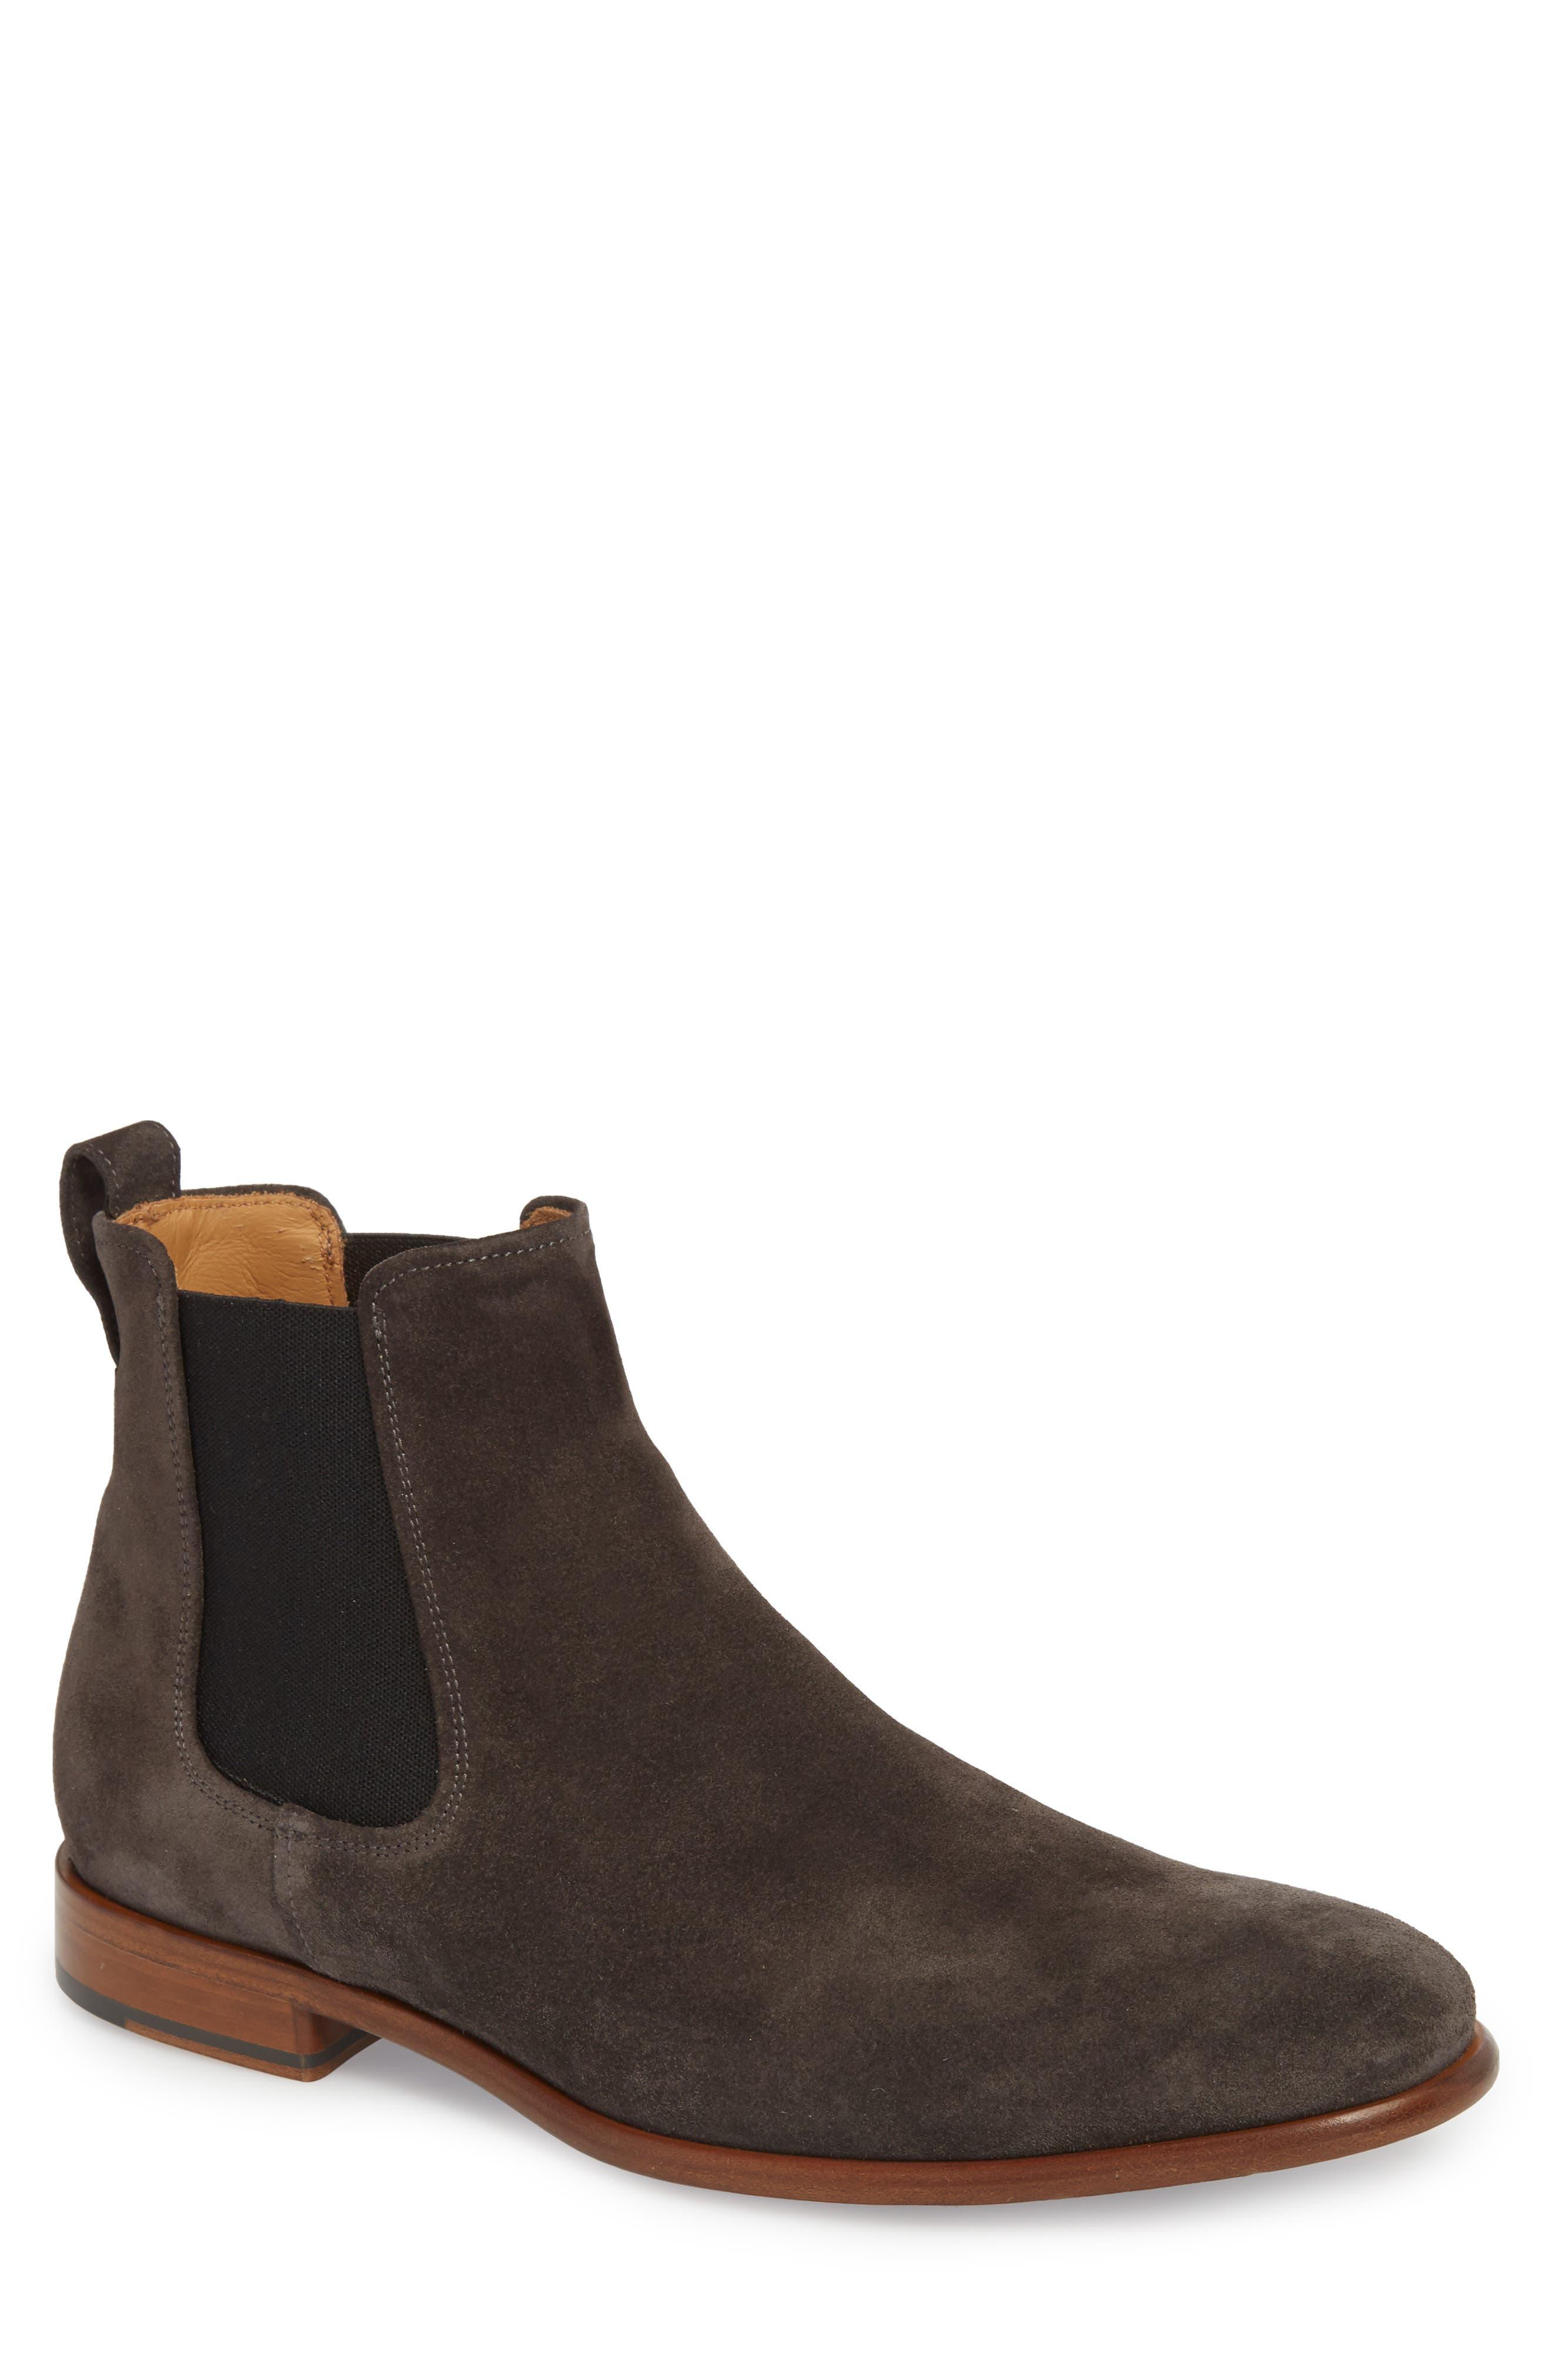 Aldous Chelsea Boot,                         Main,                         color, GRAPHITE SUEDE